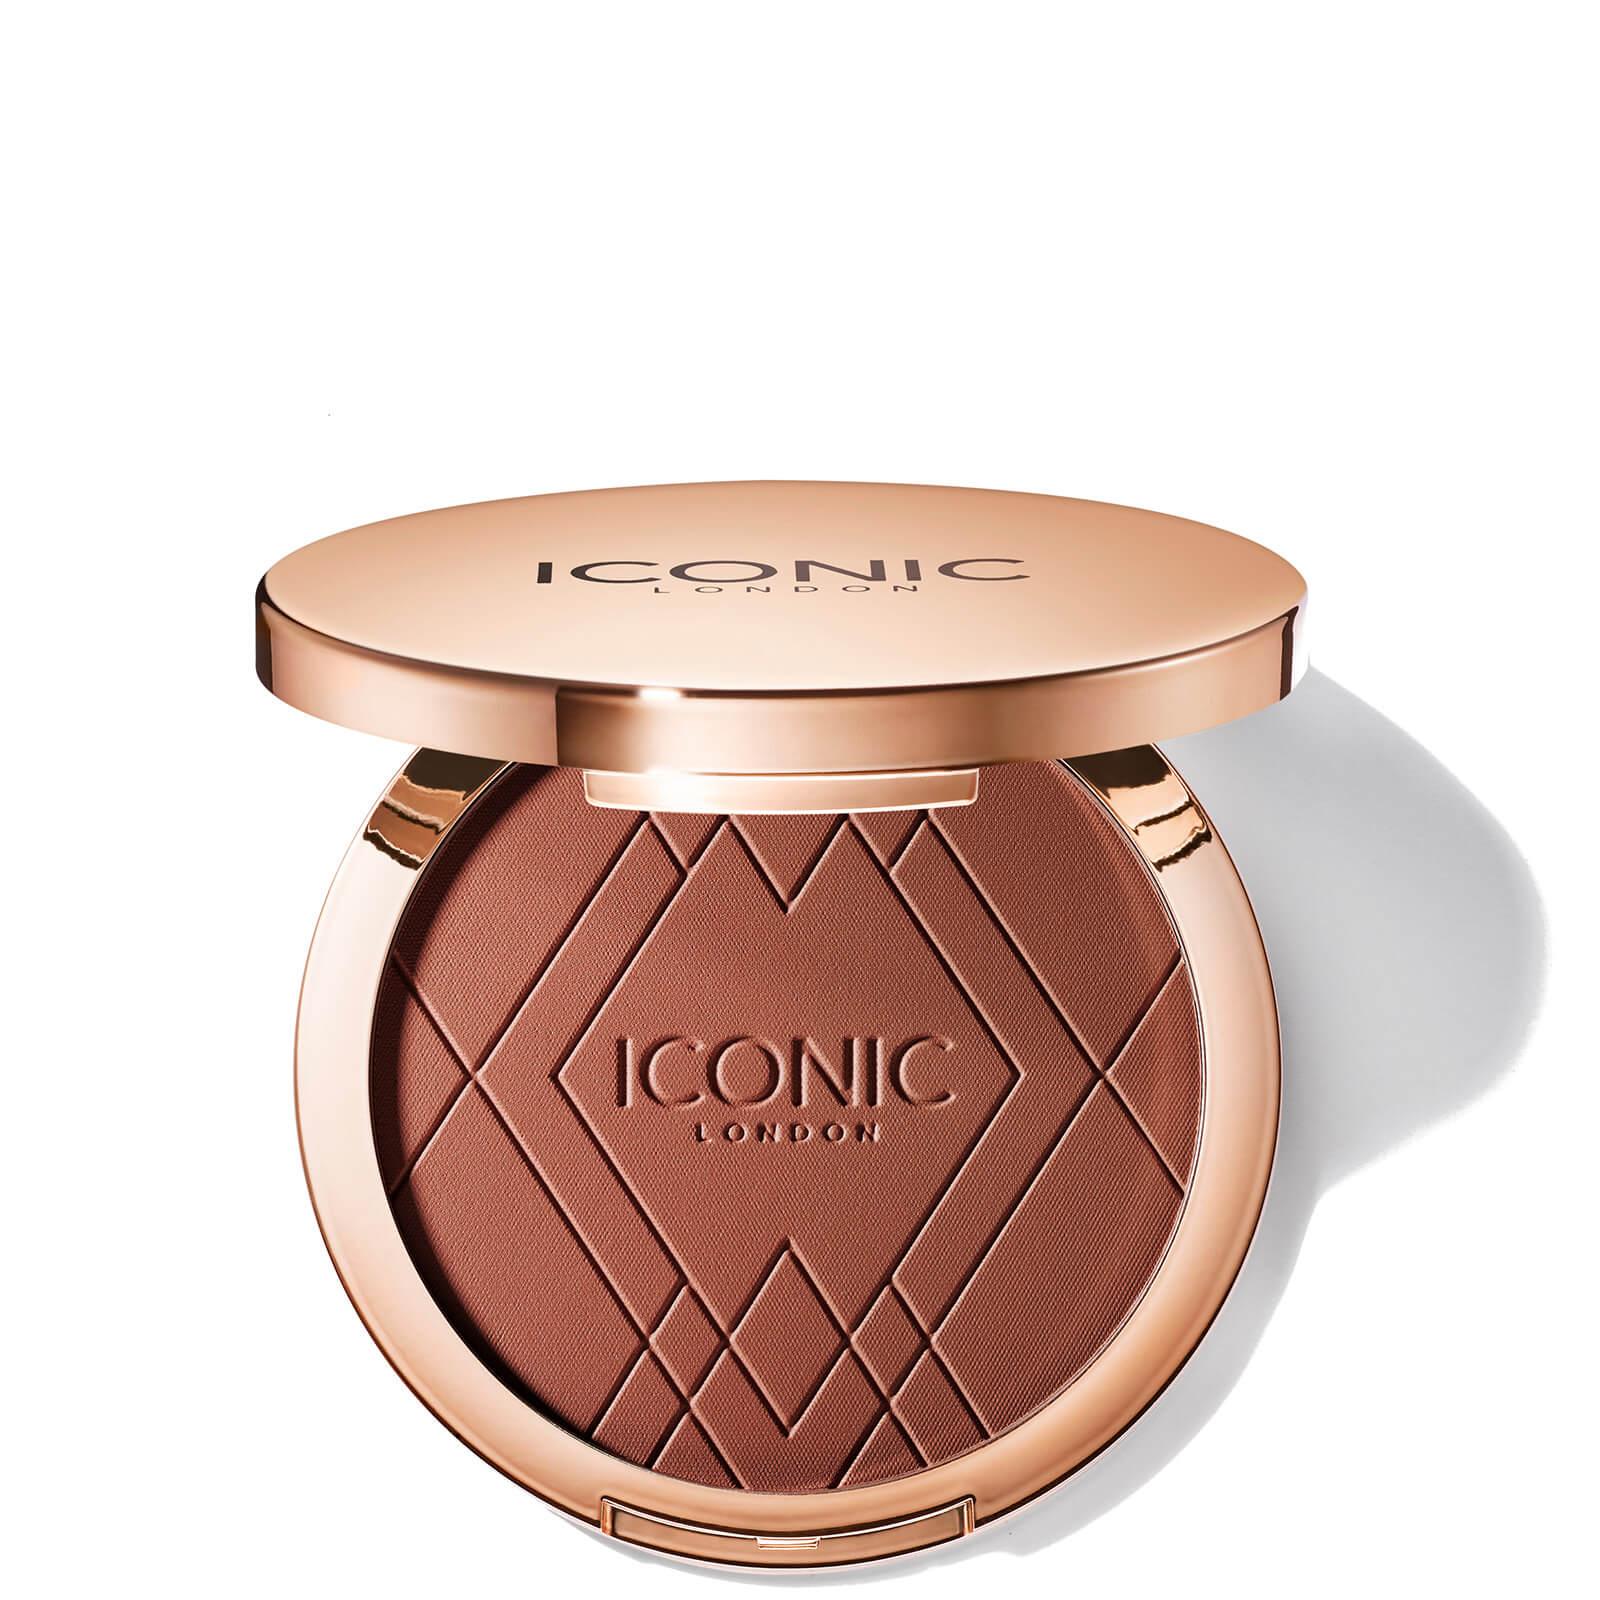 Купить ICONIC London Ultimate Bronzing Powder 17g (Various Shades) - Warm Deep Bronze